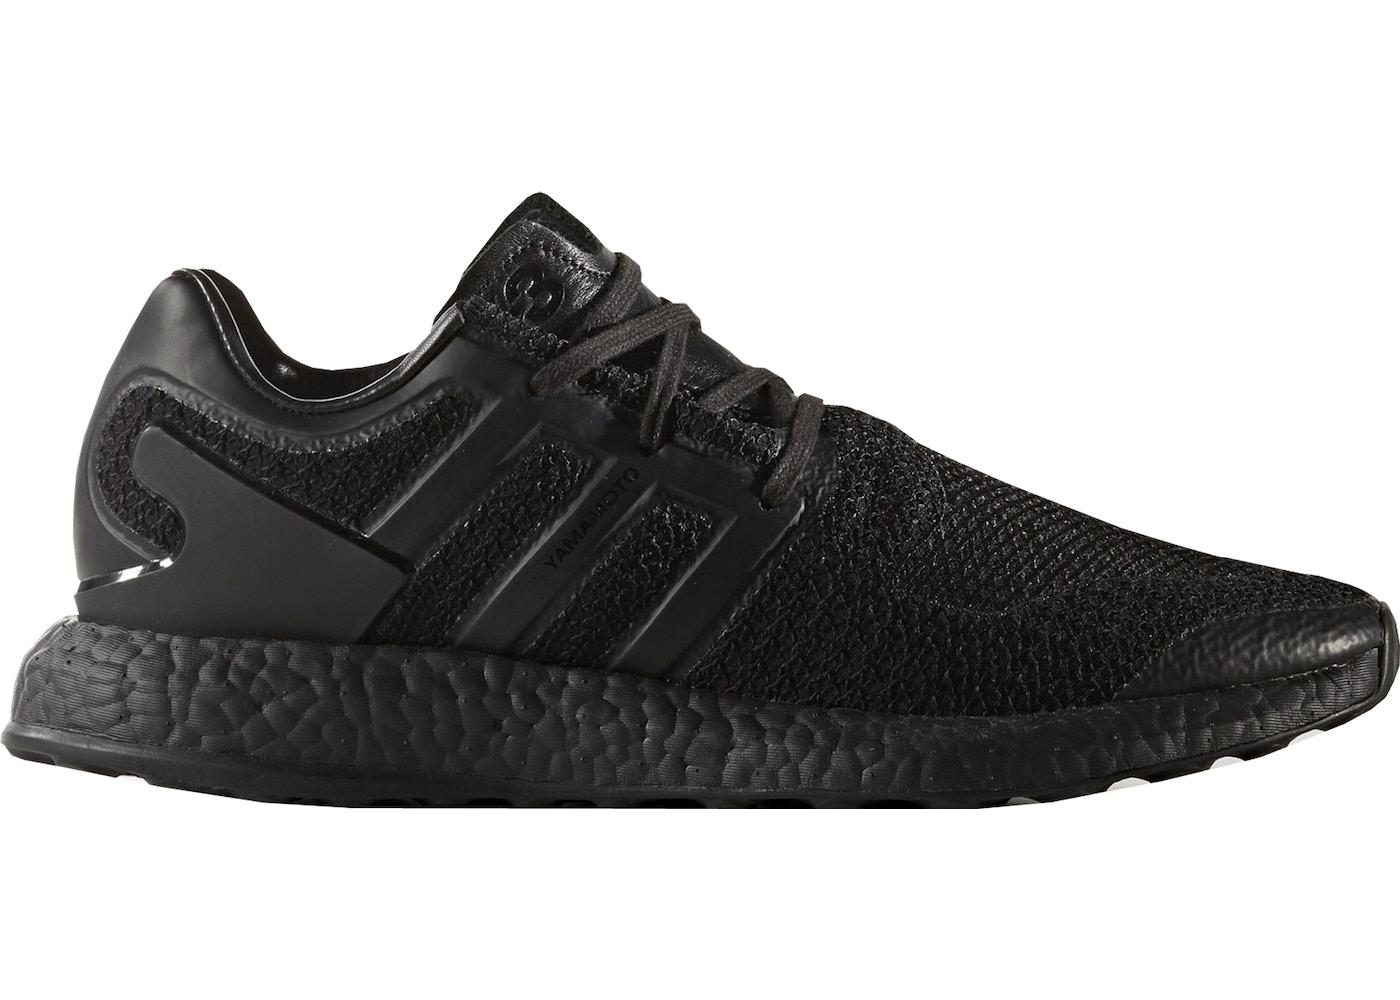 6d50ed419eed adidas Y-3 Pureboost Triple Black - CP9890